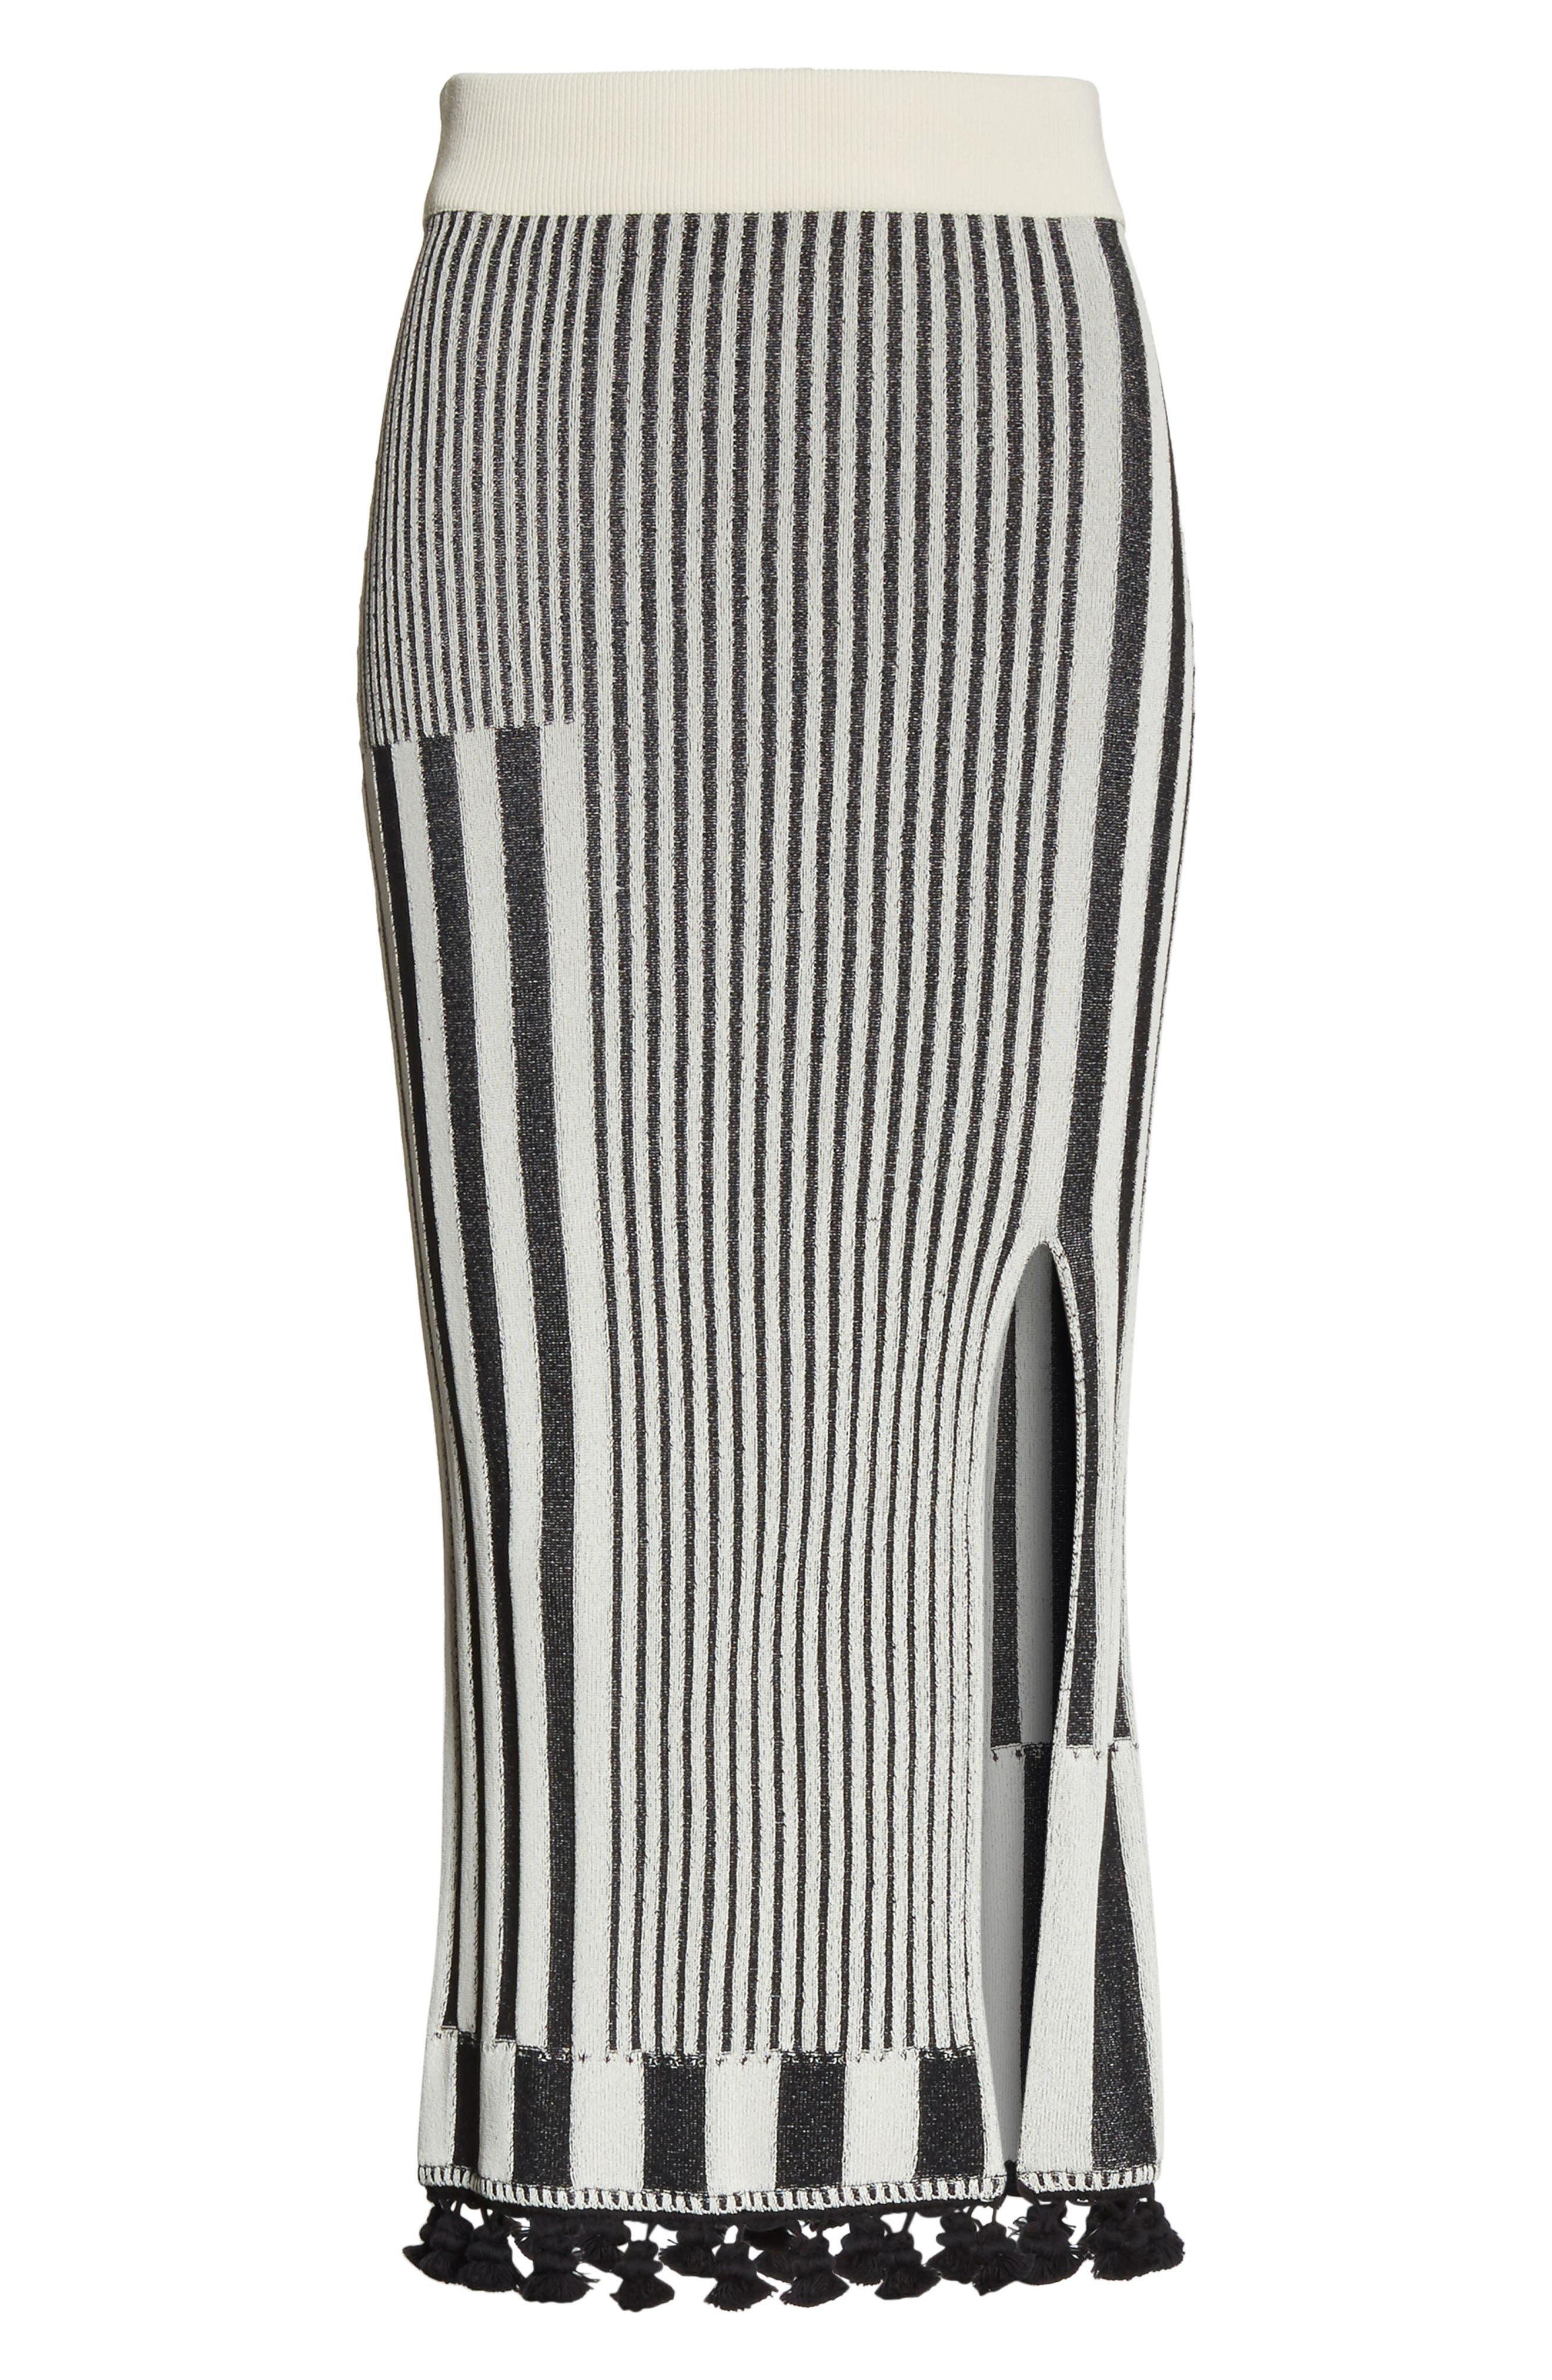 Tassel Trim Stripe Pencil Skirt,                             Alternate thumbnail 7, color,                             Black